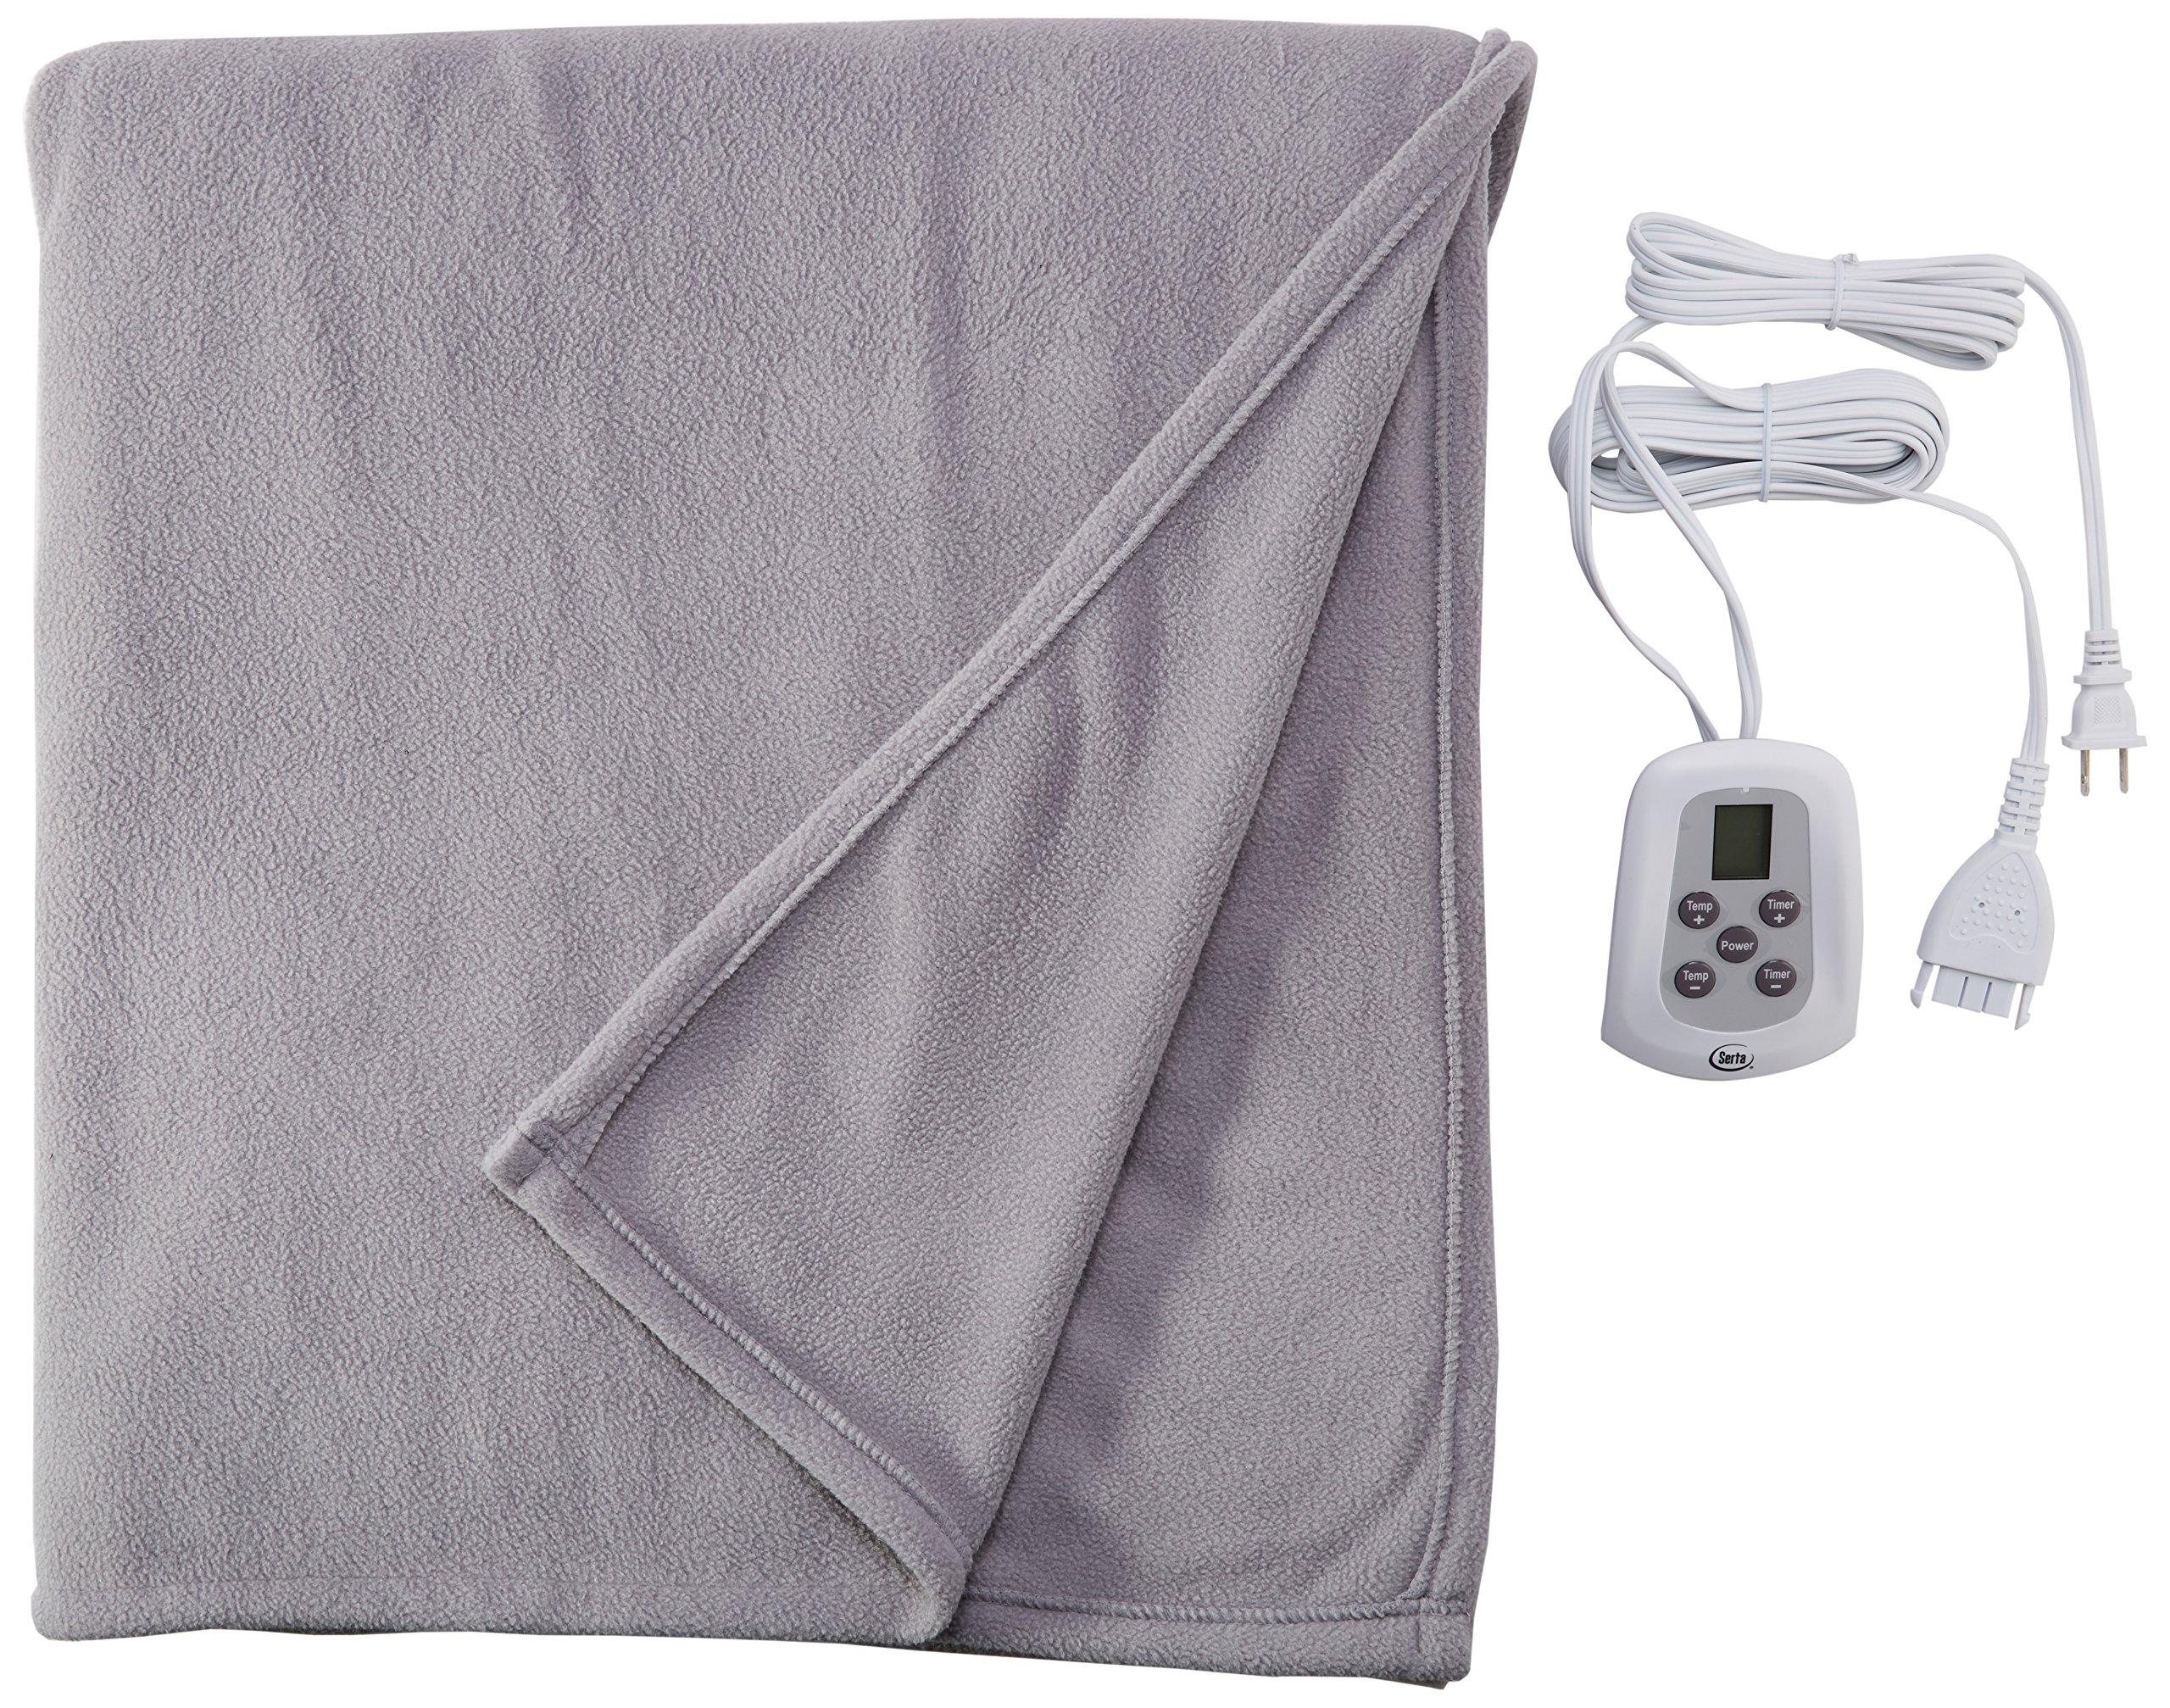 Serta 856771 Heated Eletric Fleece Blanket - with Programmable Digital Controller, Gray, King